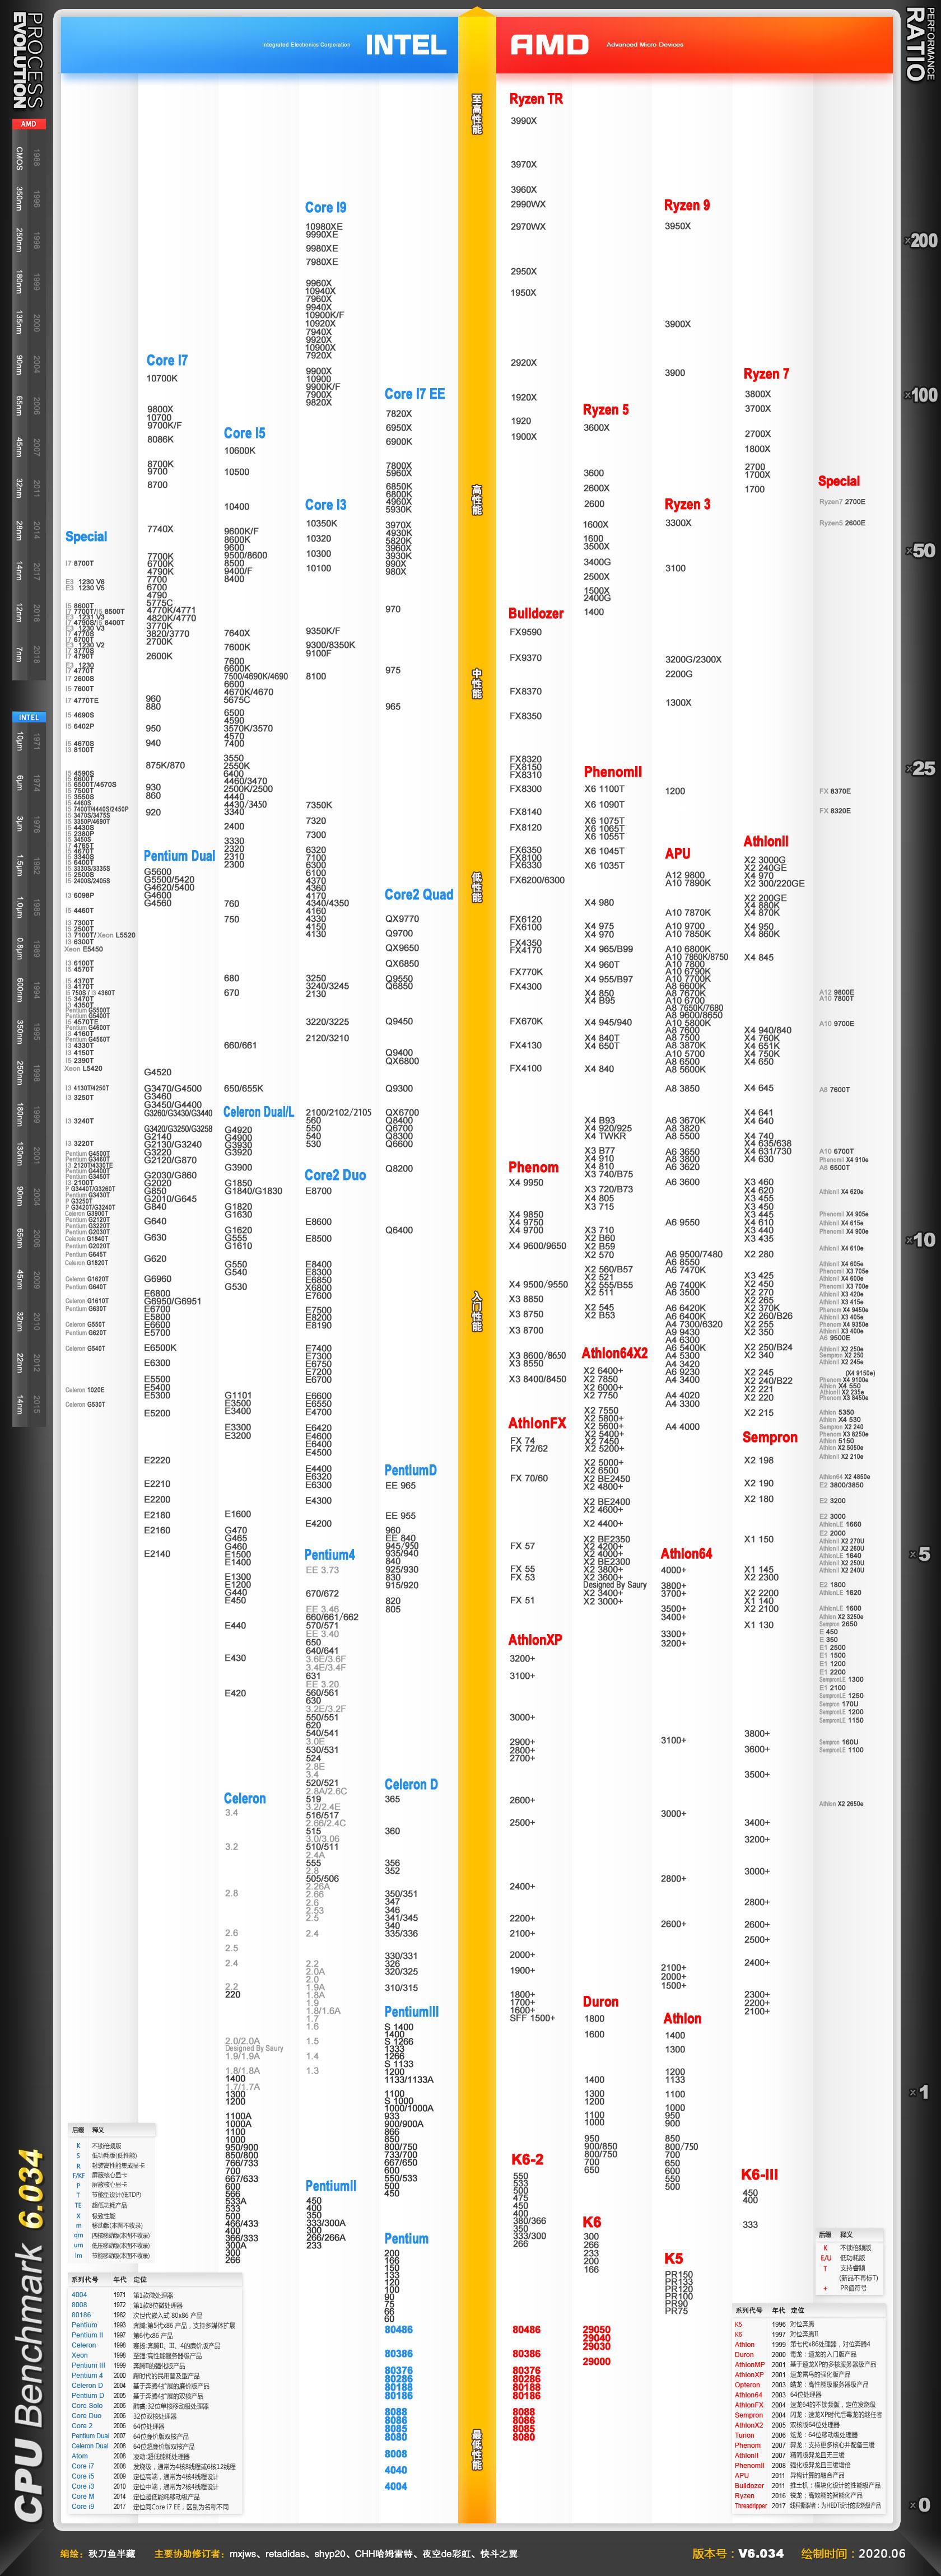 cpu天梯图2020 by retadidas,秋刀鱼半藏,快科技,pc小虫,极客boy(更新时间:2020-11-05)